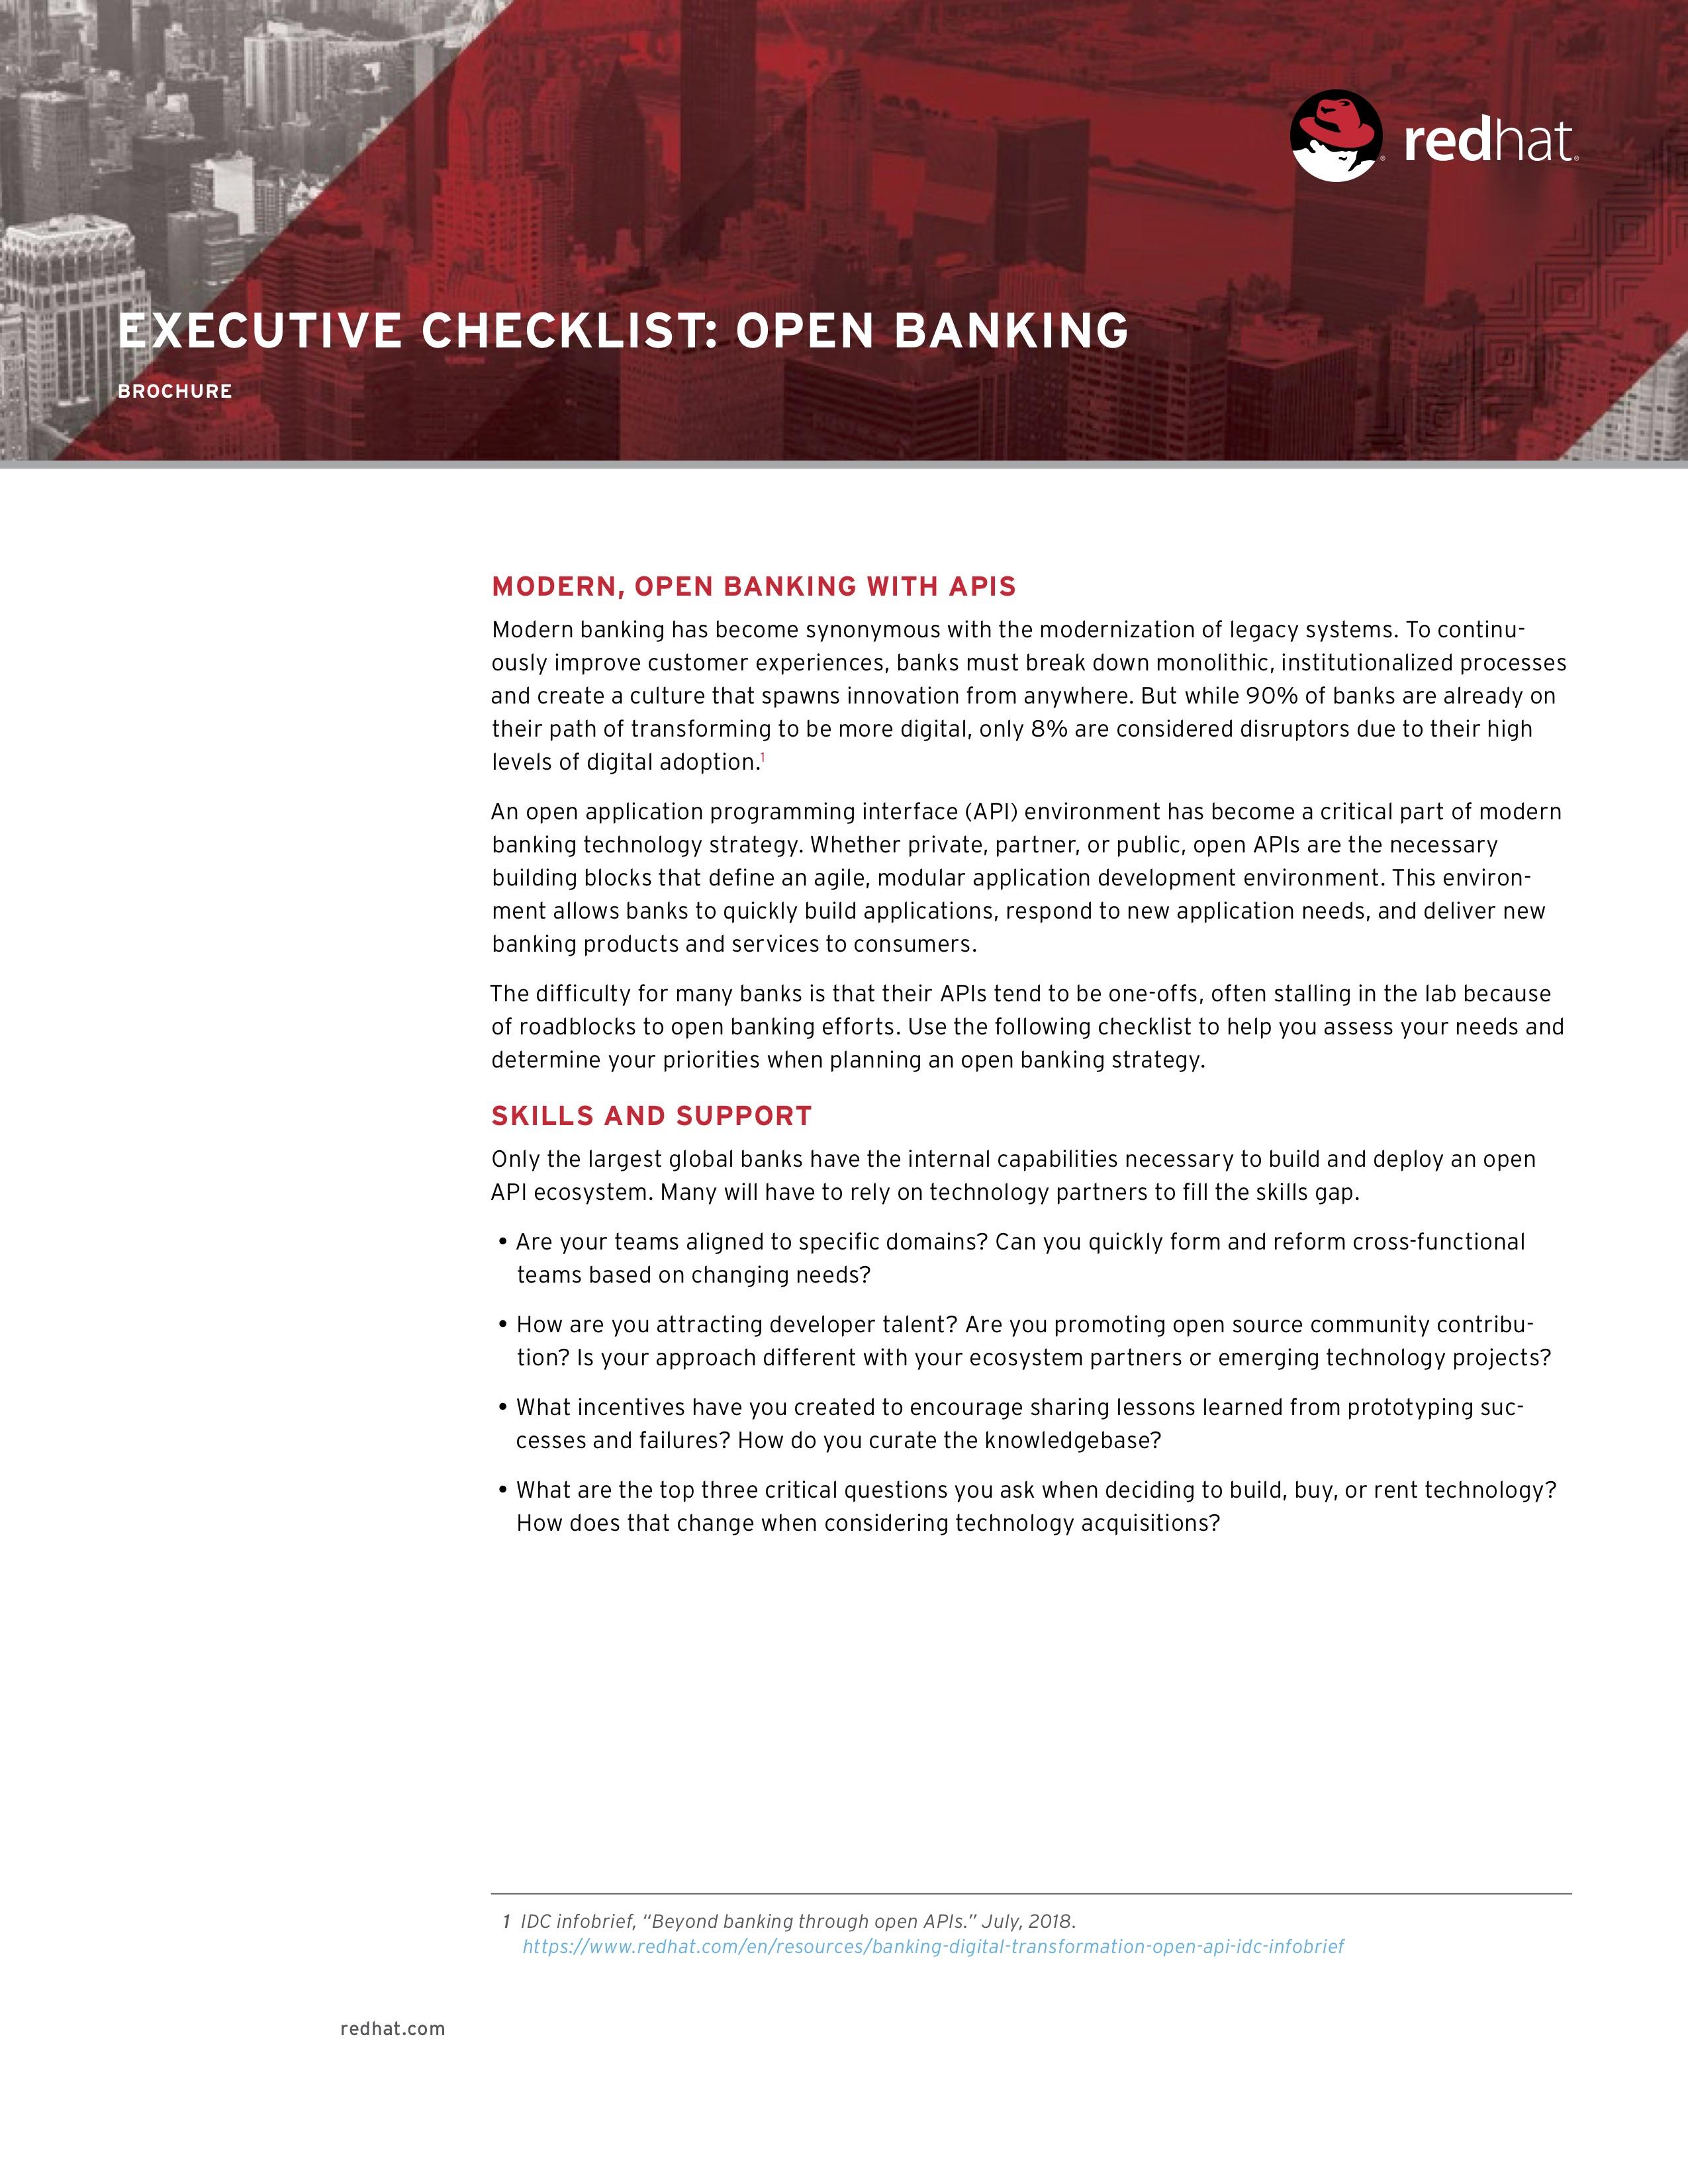 Ve fsi executive checklist brochure f13884wg 201809 en 0